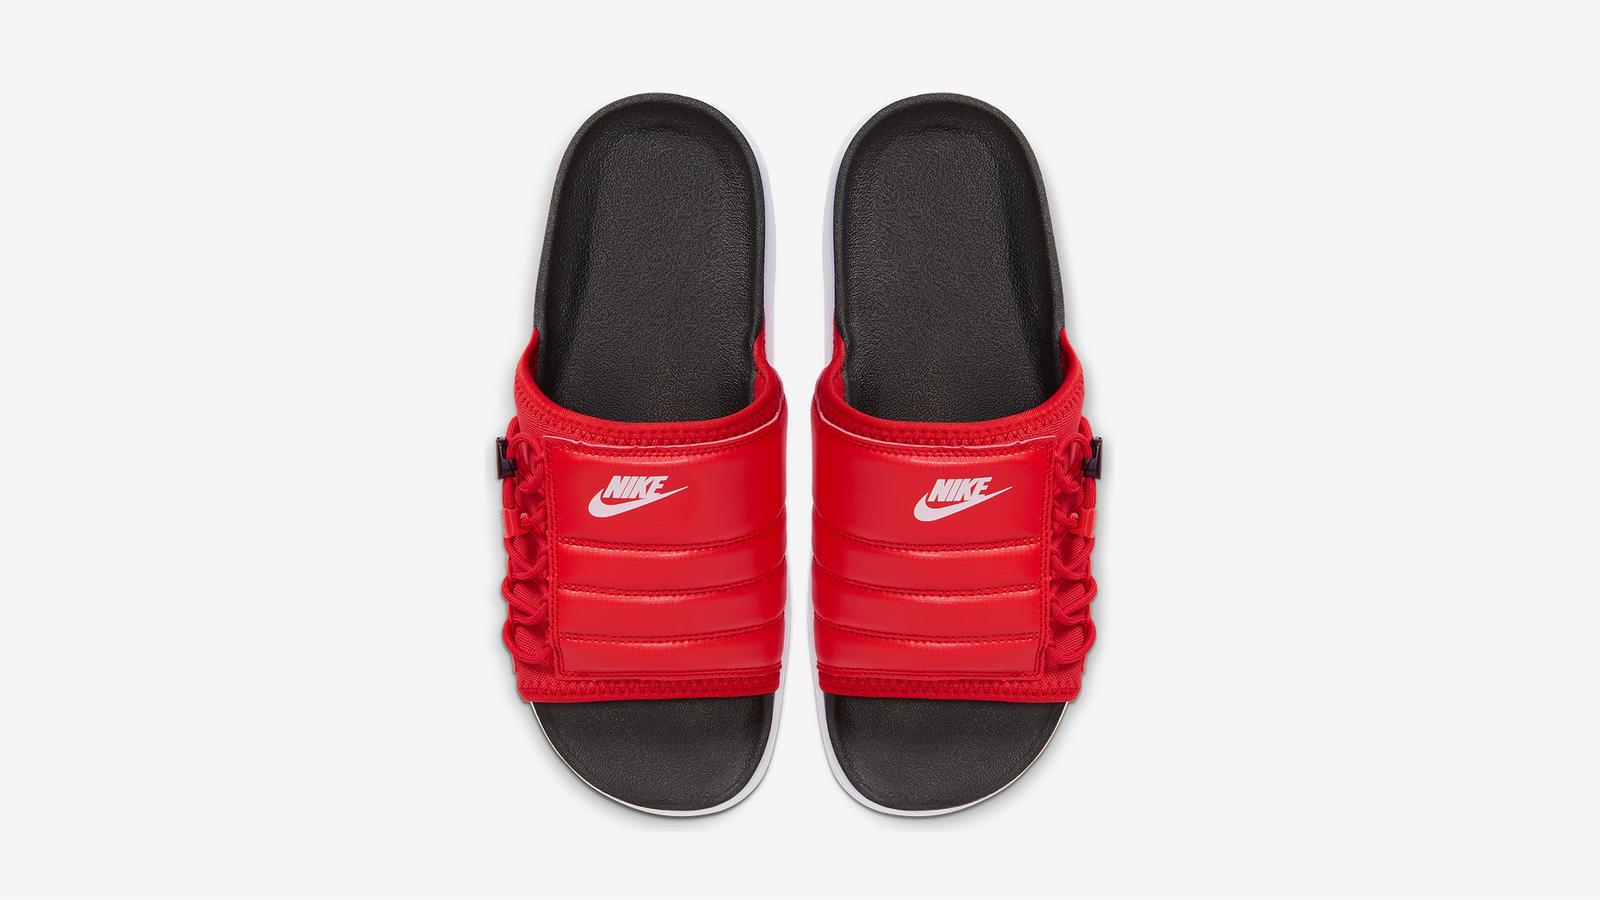 Nike Sportswear Summer 2020 Sandals Nike Canyon Nike Asuna Nike Owaysis 11